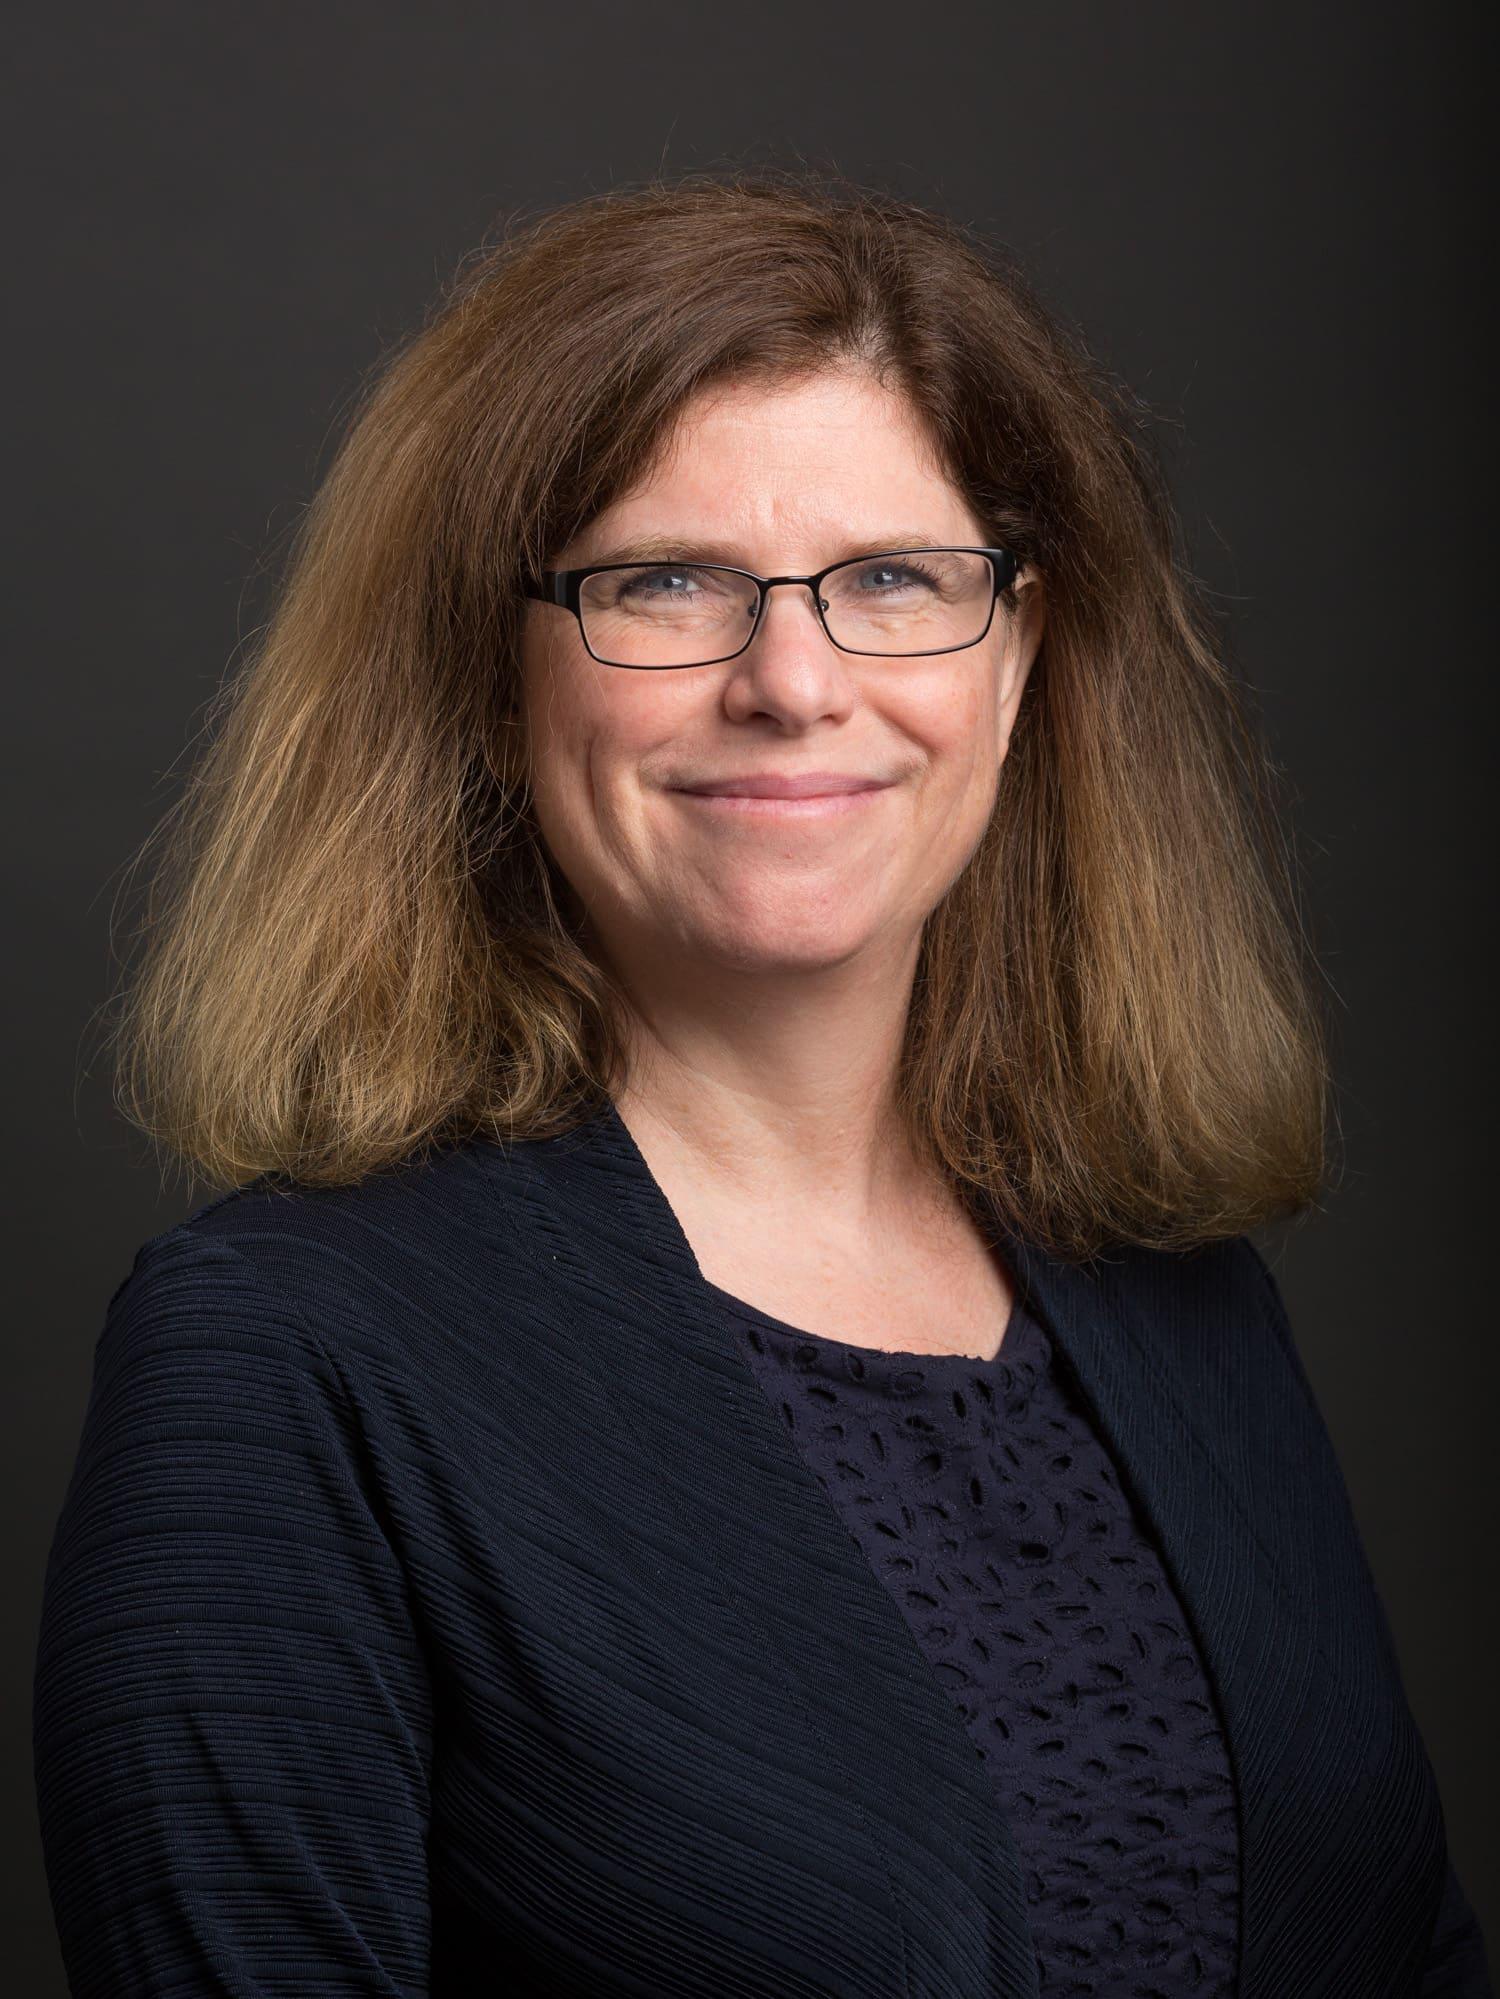 Harriet Kluger